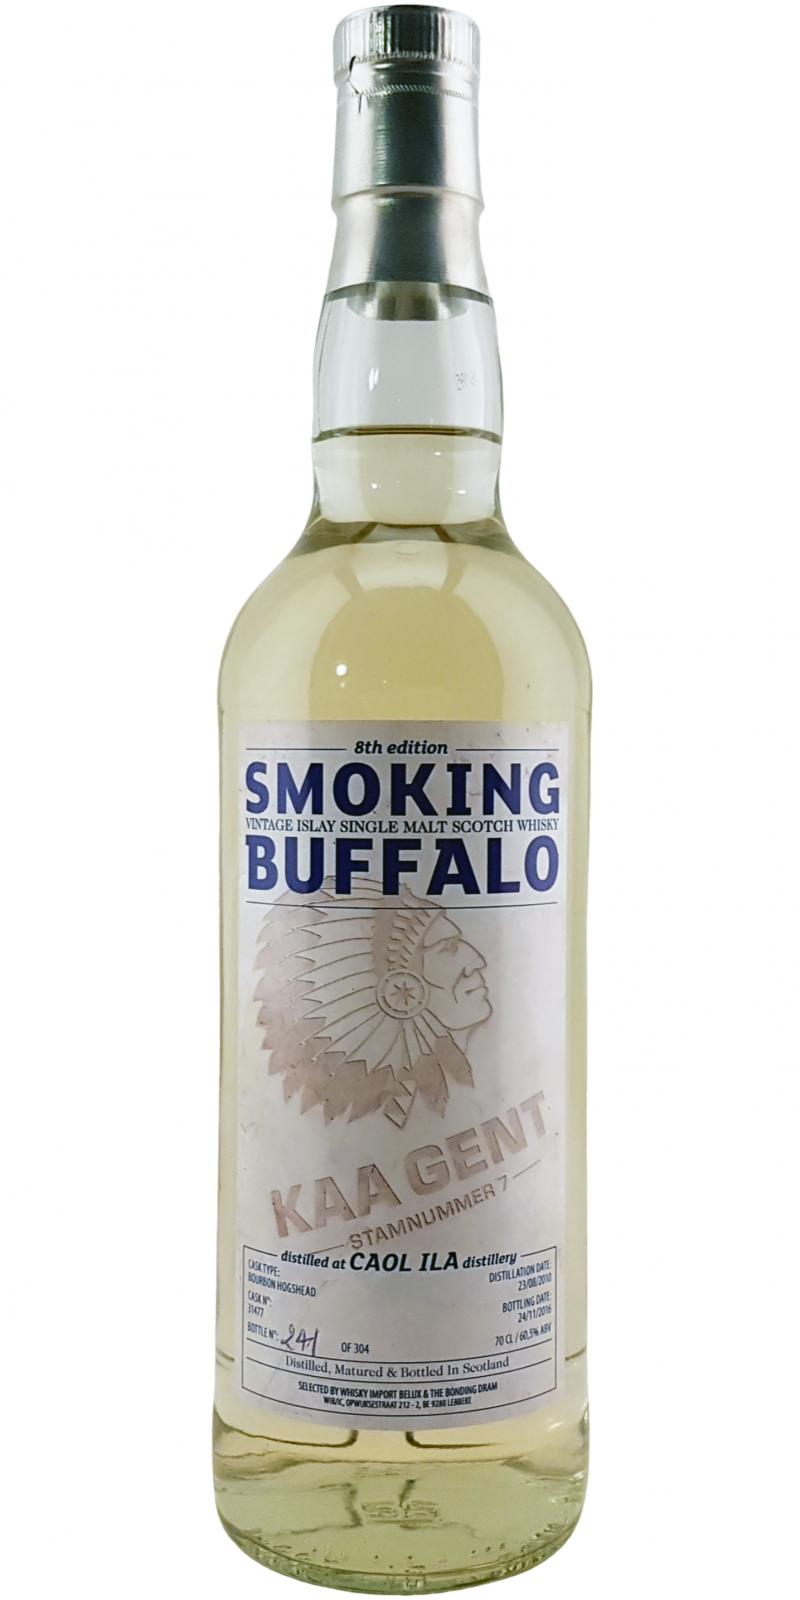 Smoking Buffalo 8th Edition TBD